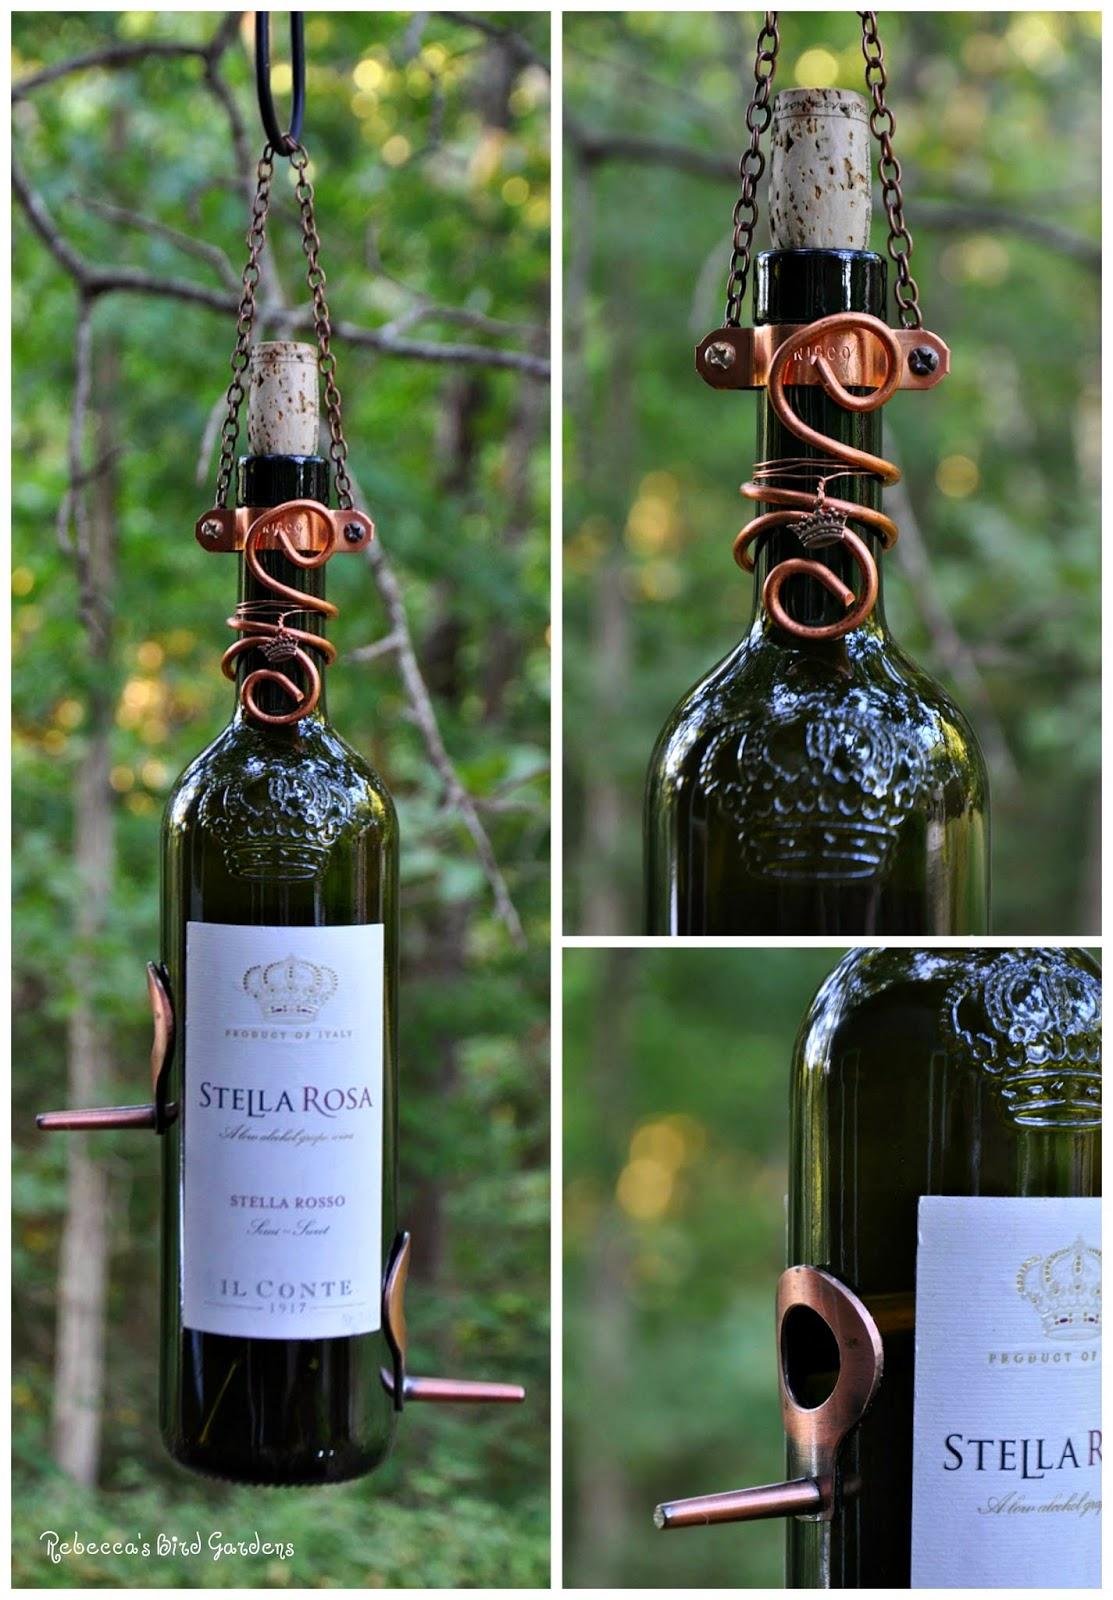 Rebecca 39 s bird gardens blog custom wine bottle bird feeders for How to build a birdhouse out of wine corks